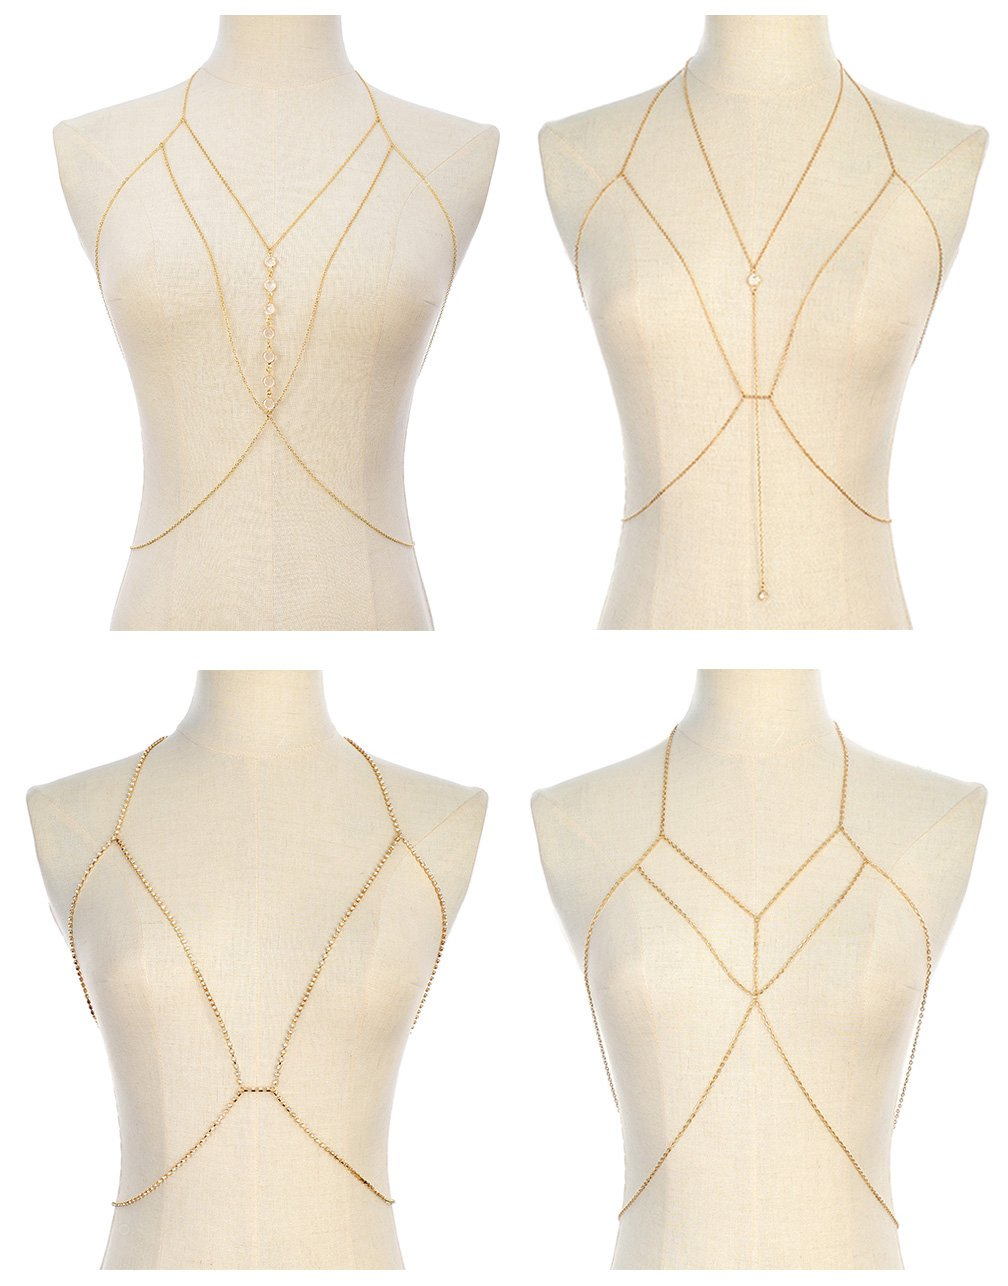 Tornito 4Pcs Bra Chain Sexy Belly Waist Chain Pendent Necklace Summer Beach Bikini Body Chain Jewelry for Women Girls Gold Tone